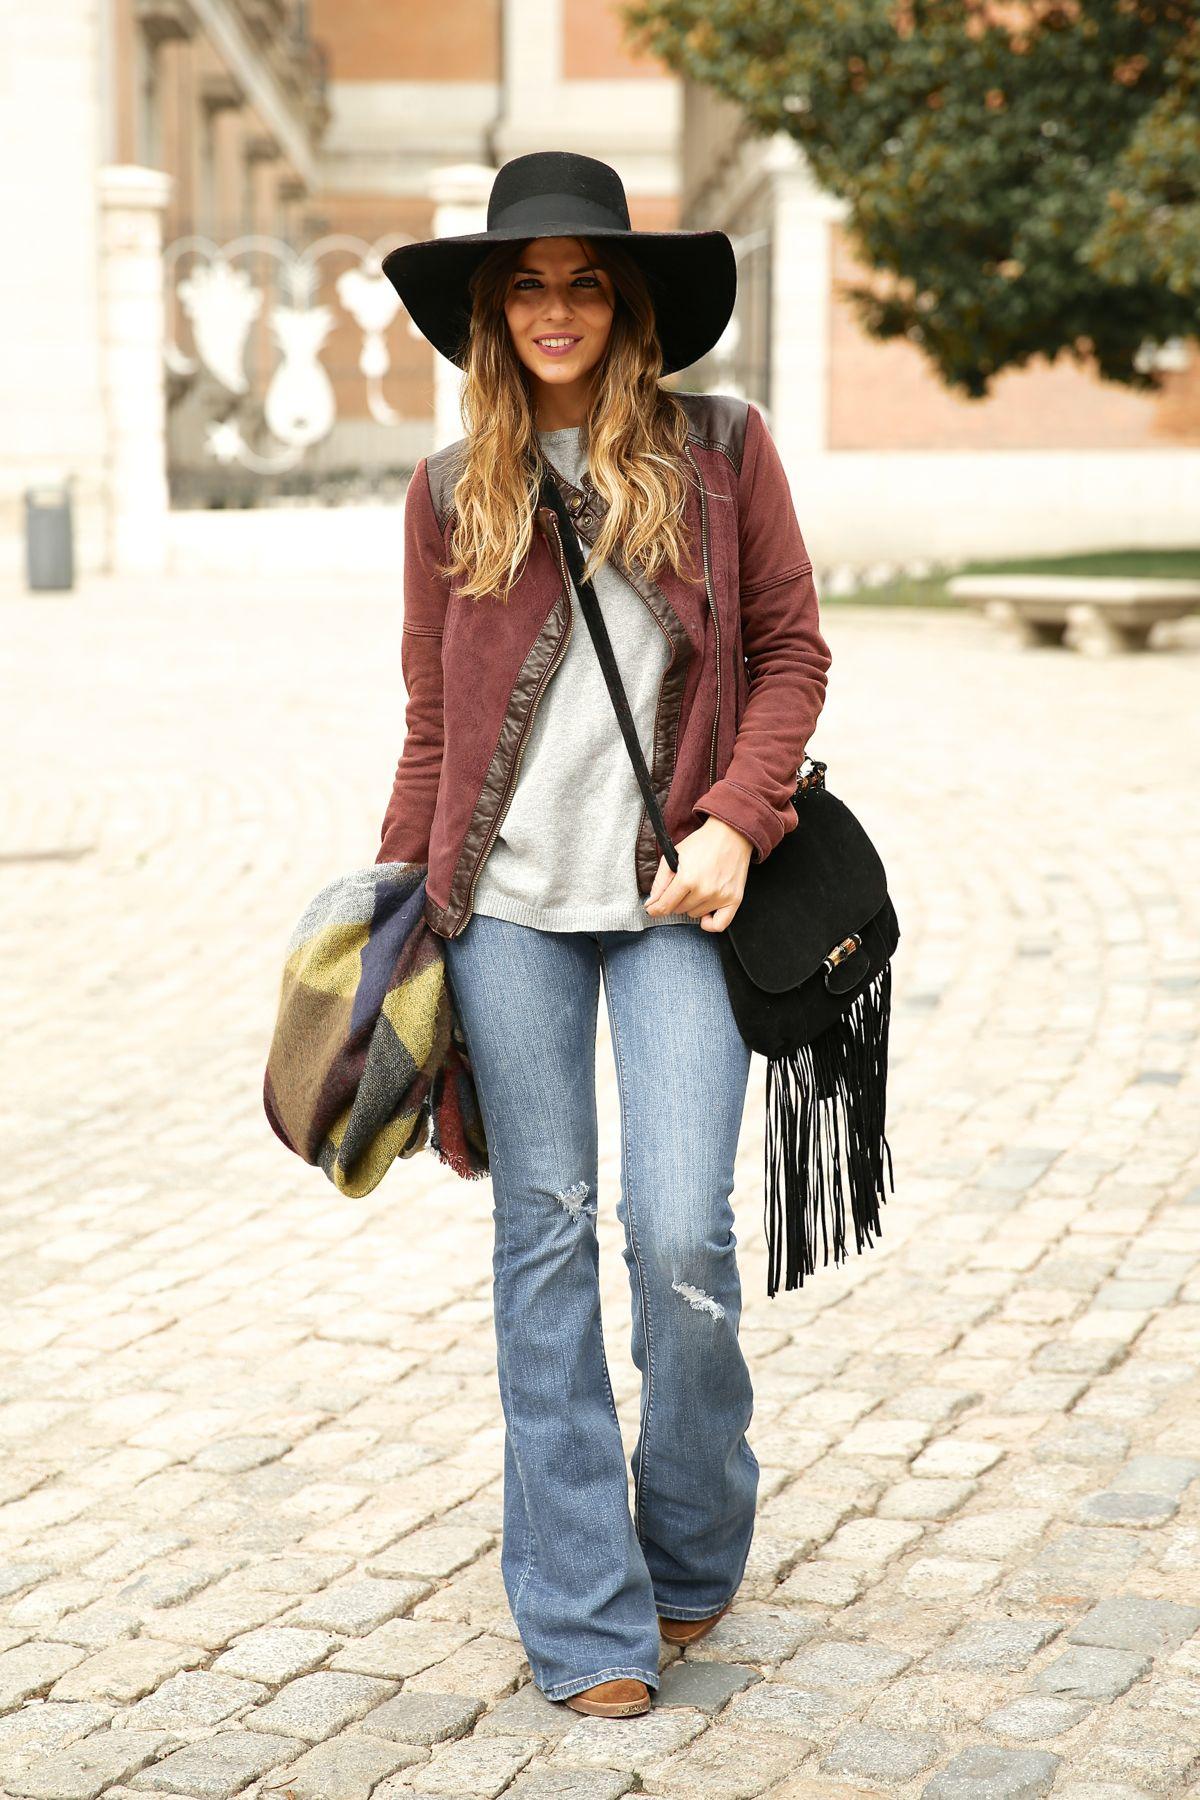 trendy_taste-look-outfit-street_style-ootd-blog-blogger-fashion_spain-moda_españa-AD-adolfo_dominguez-amaia_salamanca-boho-hippie-sombrero-hat-biker-flecos-fringes-7